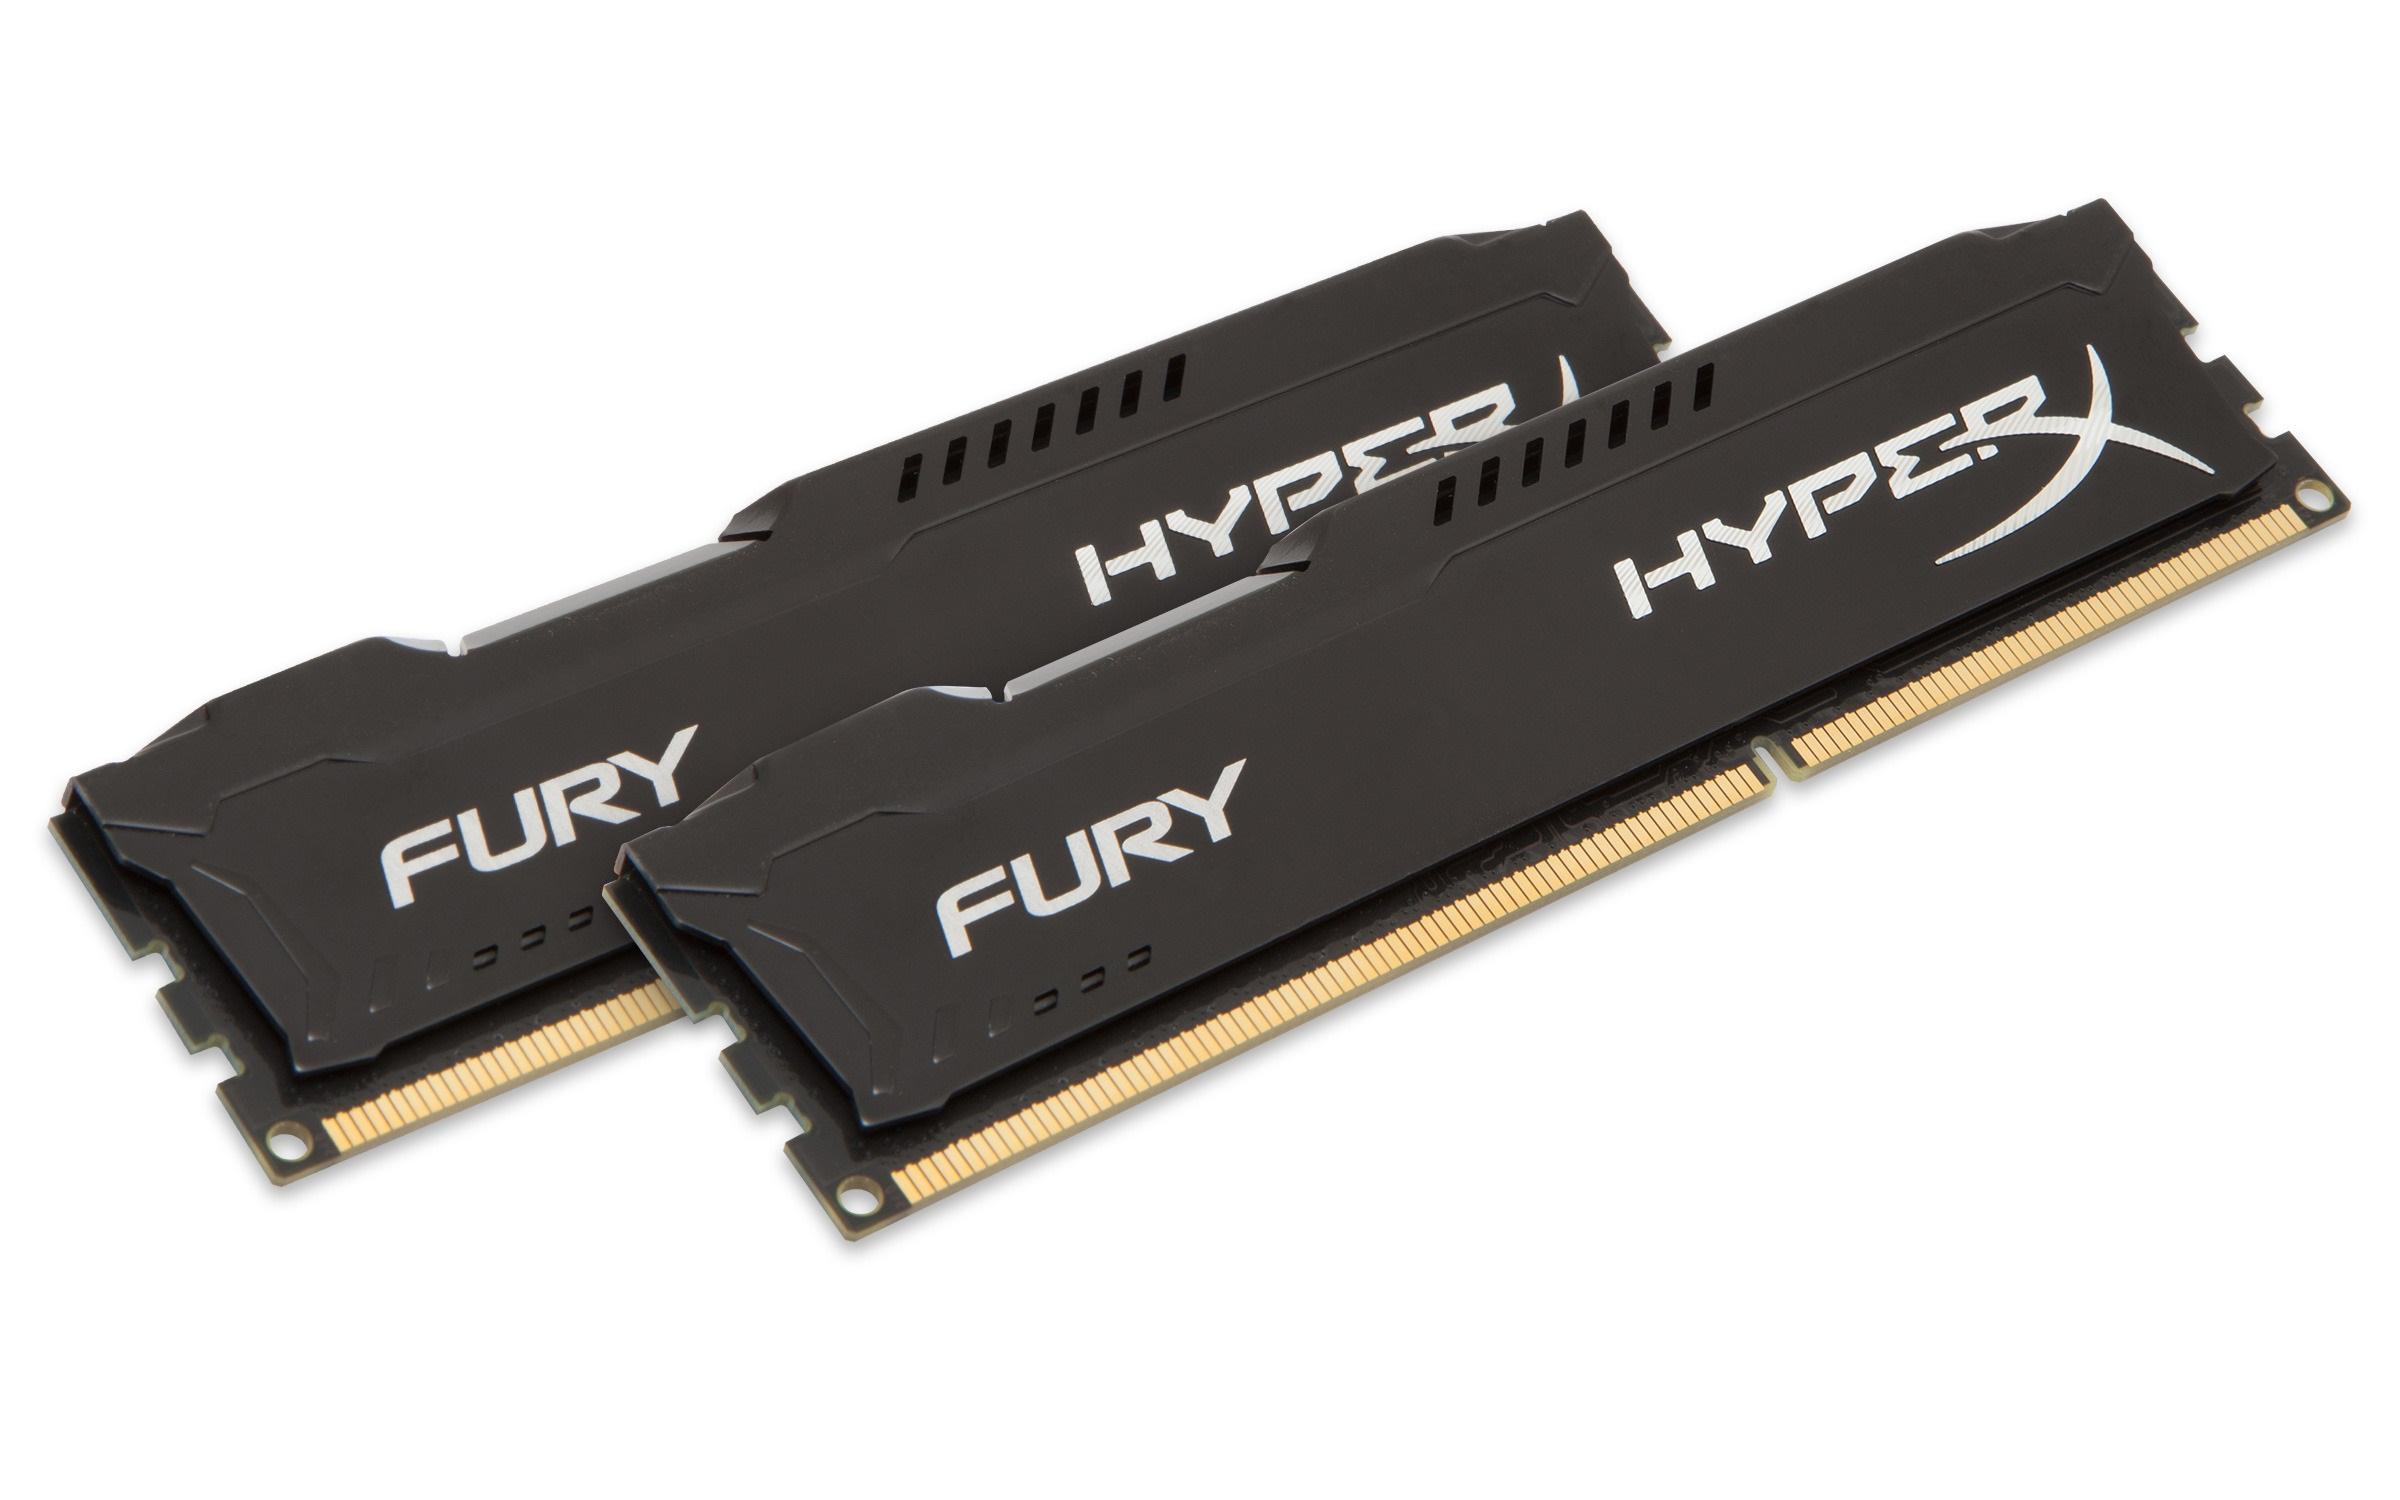 HyperX Fury 8GB (Kit 2x4GB) 1600MHz DDR3 CL10 DIMM 1.5V, černý chladič